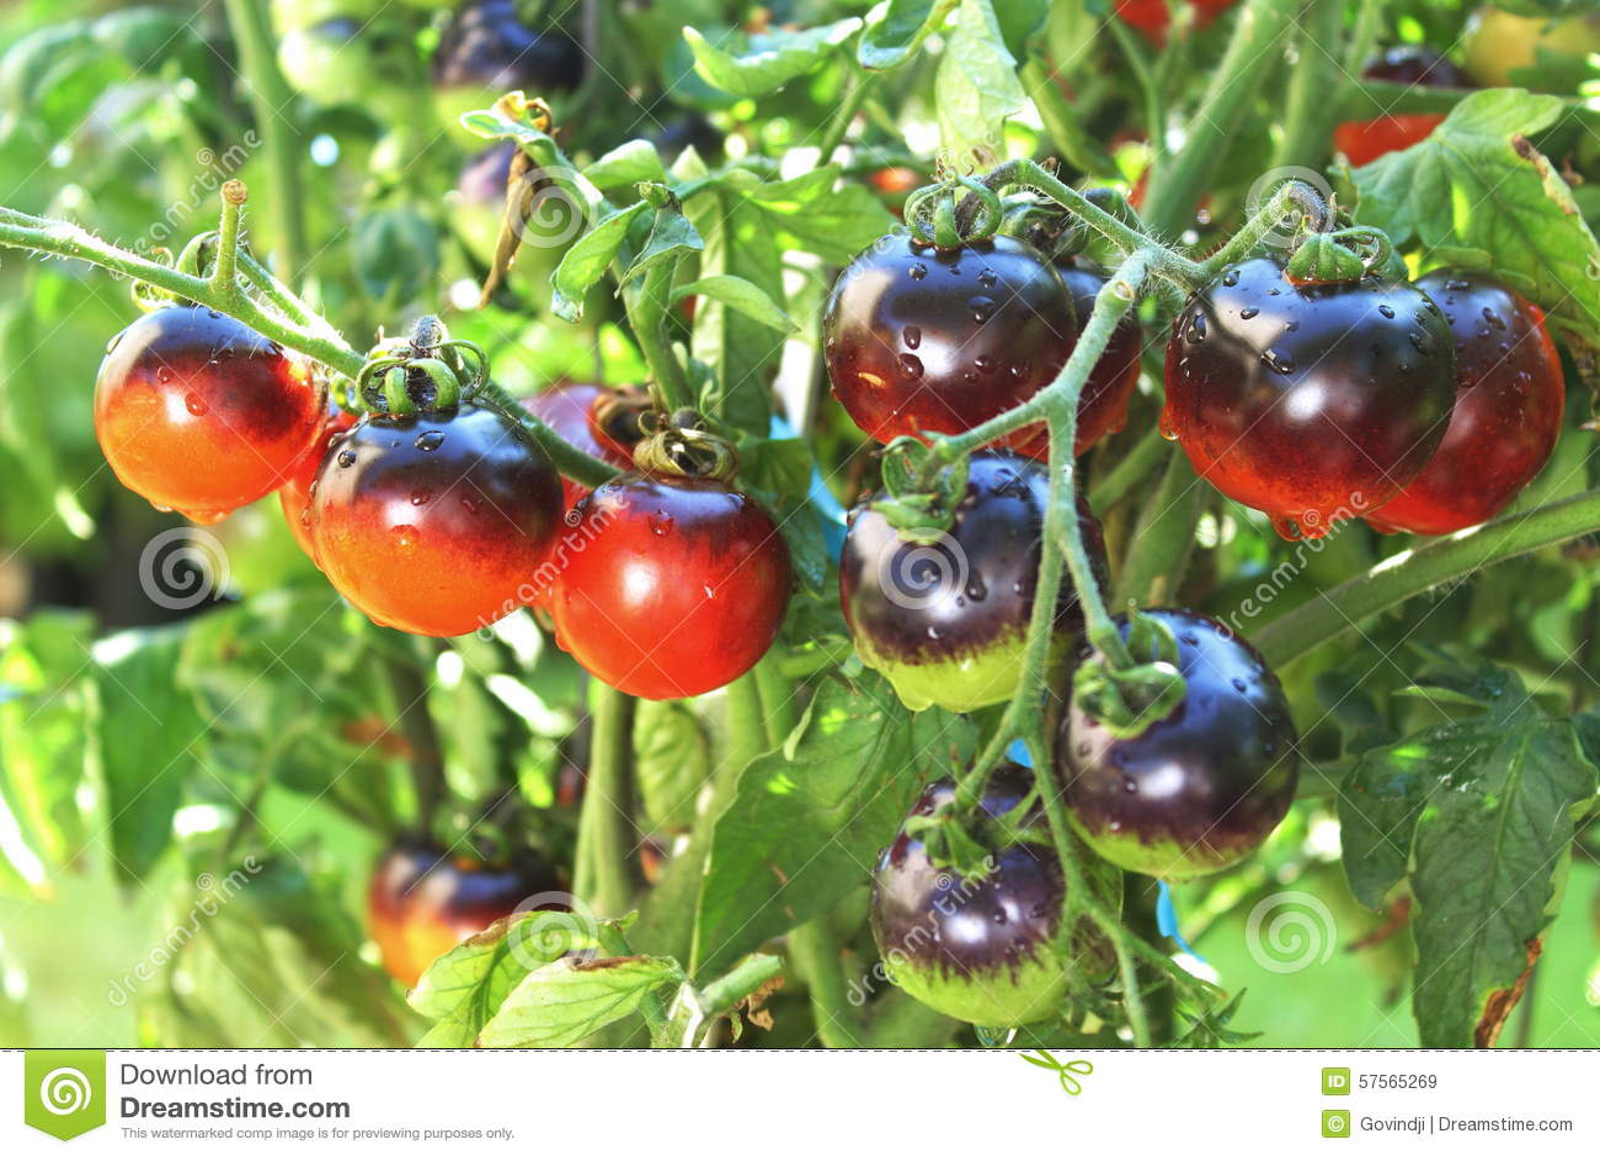 indigo rose black tomato on tomato plant stock photo image 57565269. Black Bedroom Furniture Sets. Home Design Ideas